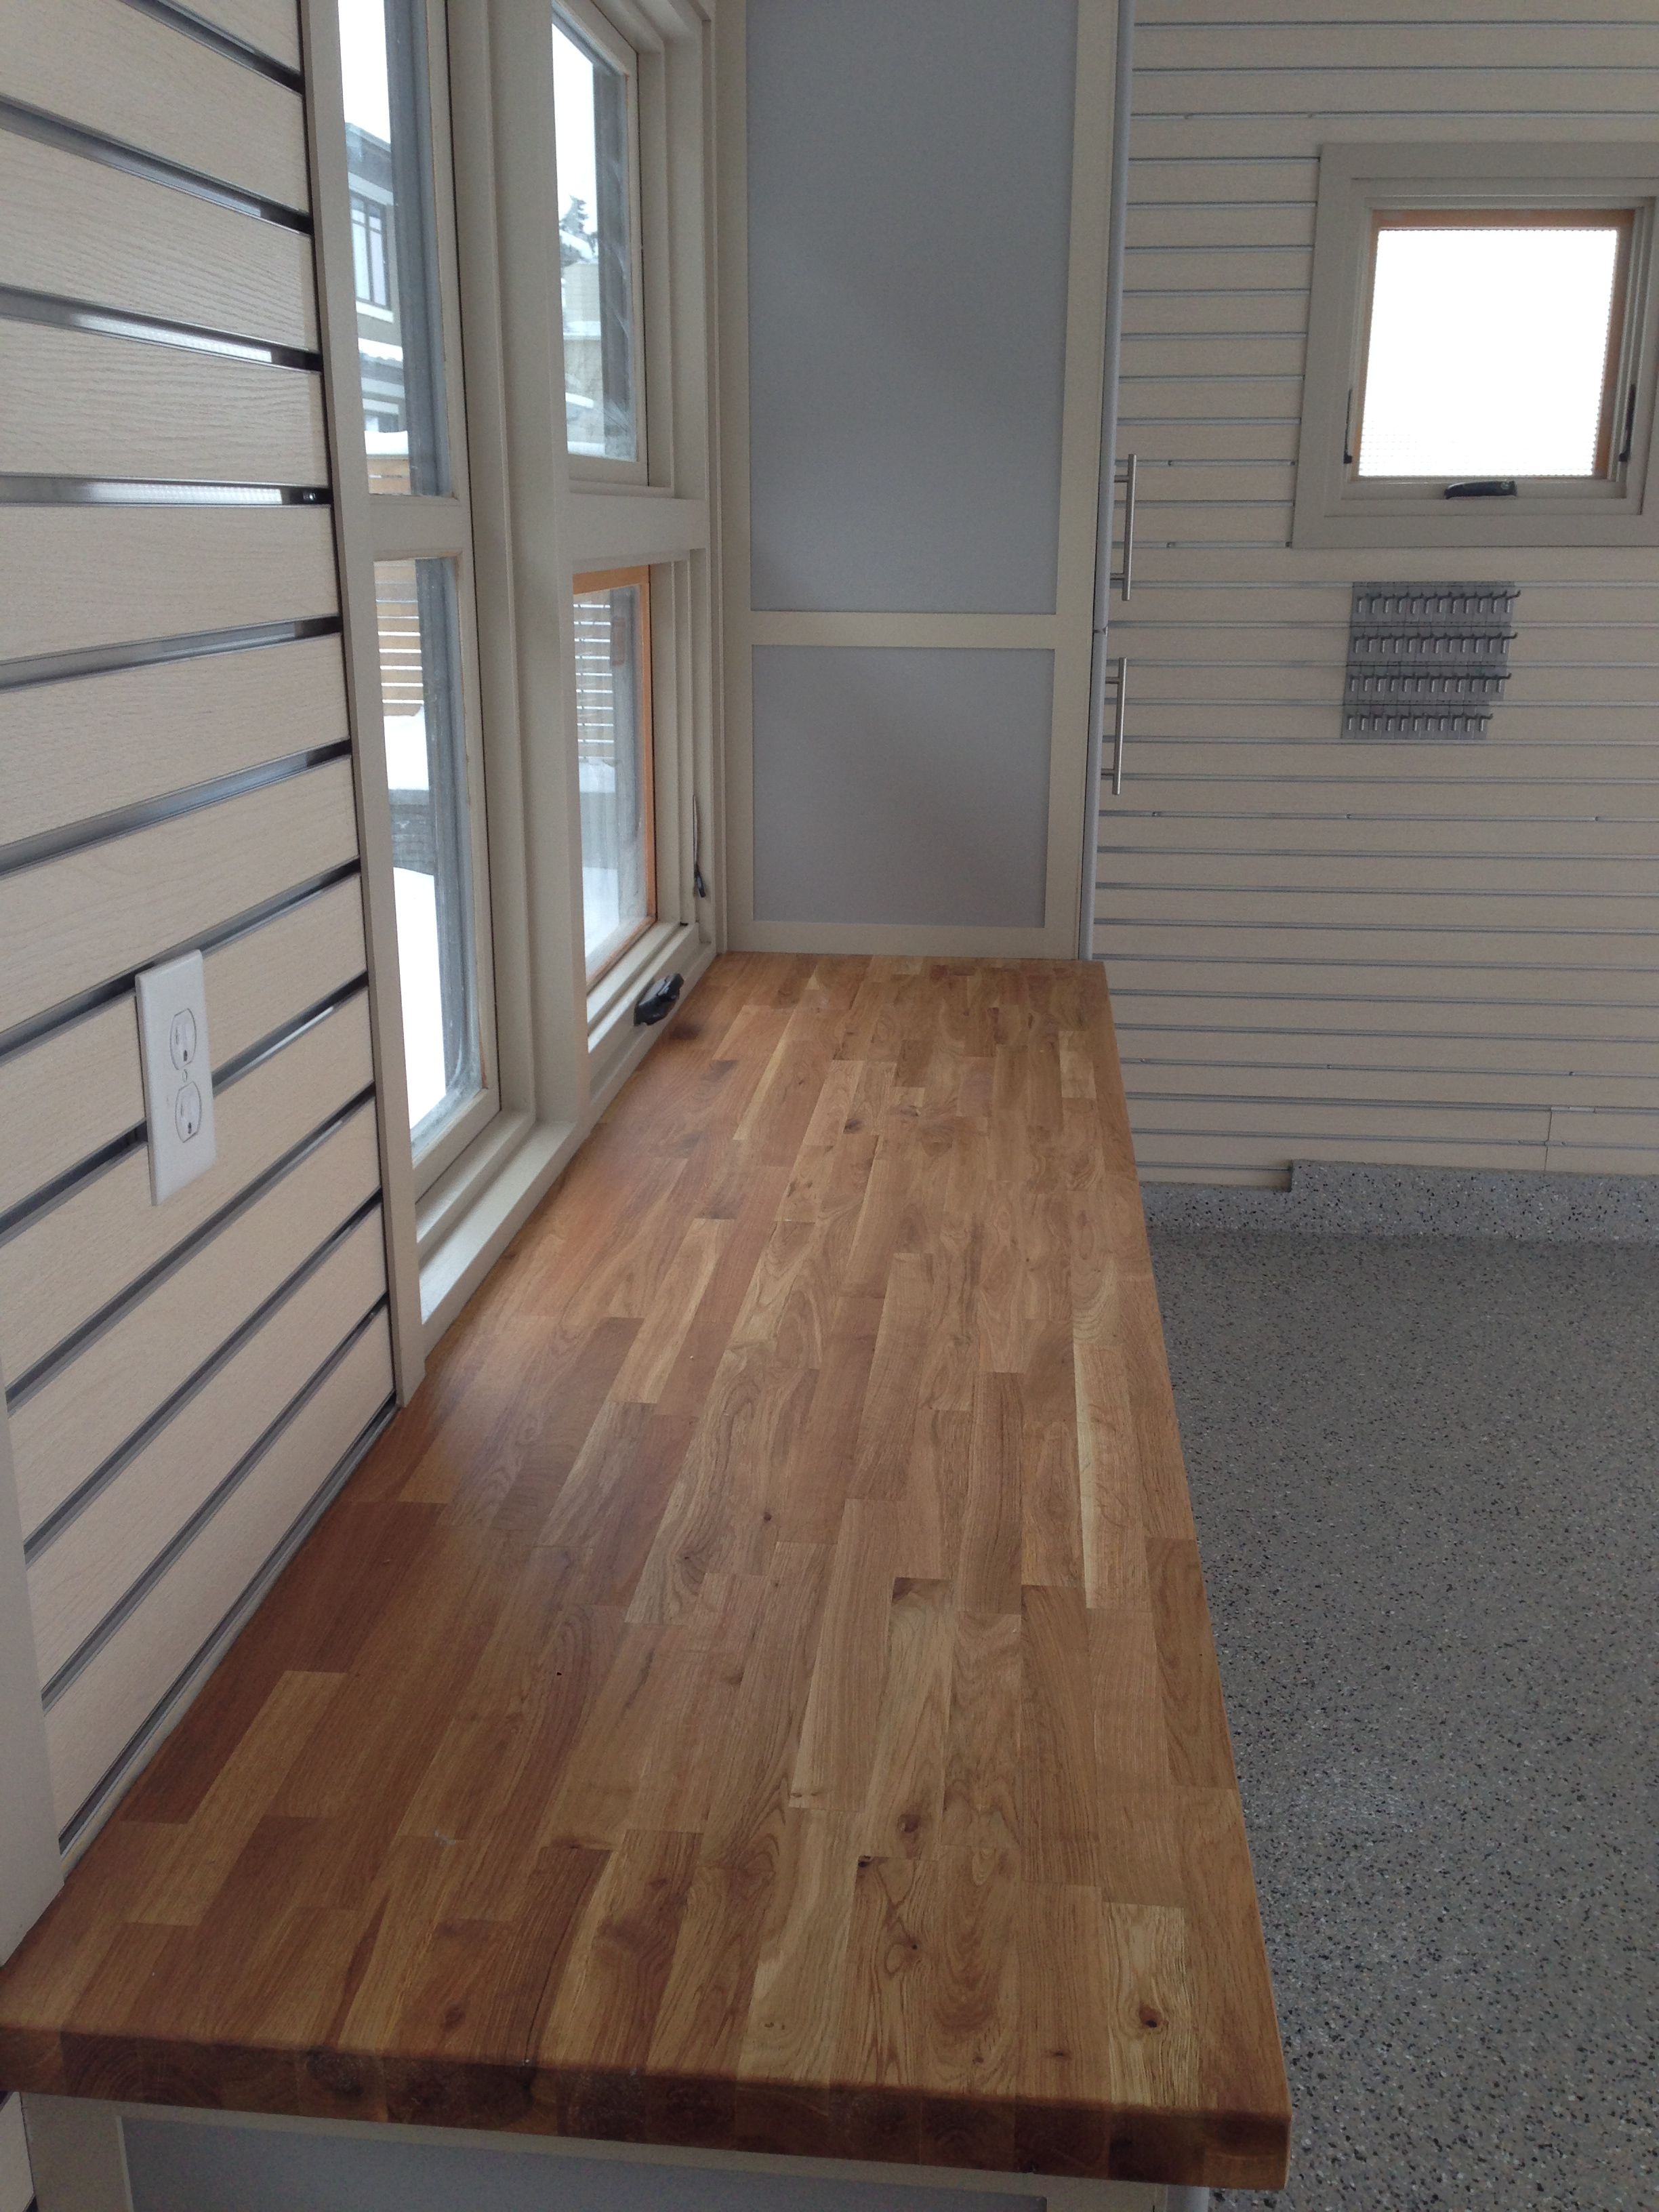 Custom Garage Epoxy Floor Designs: Calgary Garage Renovation